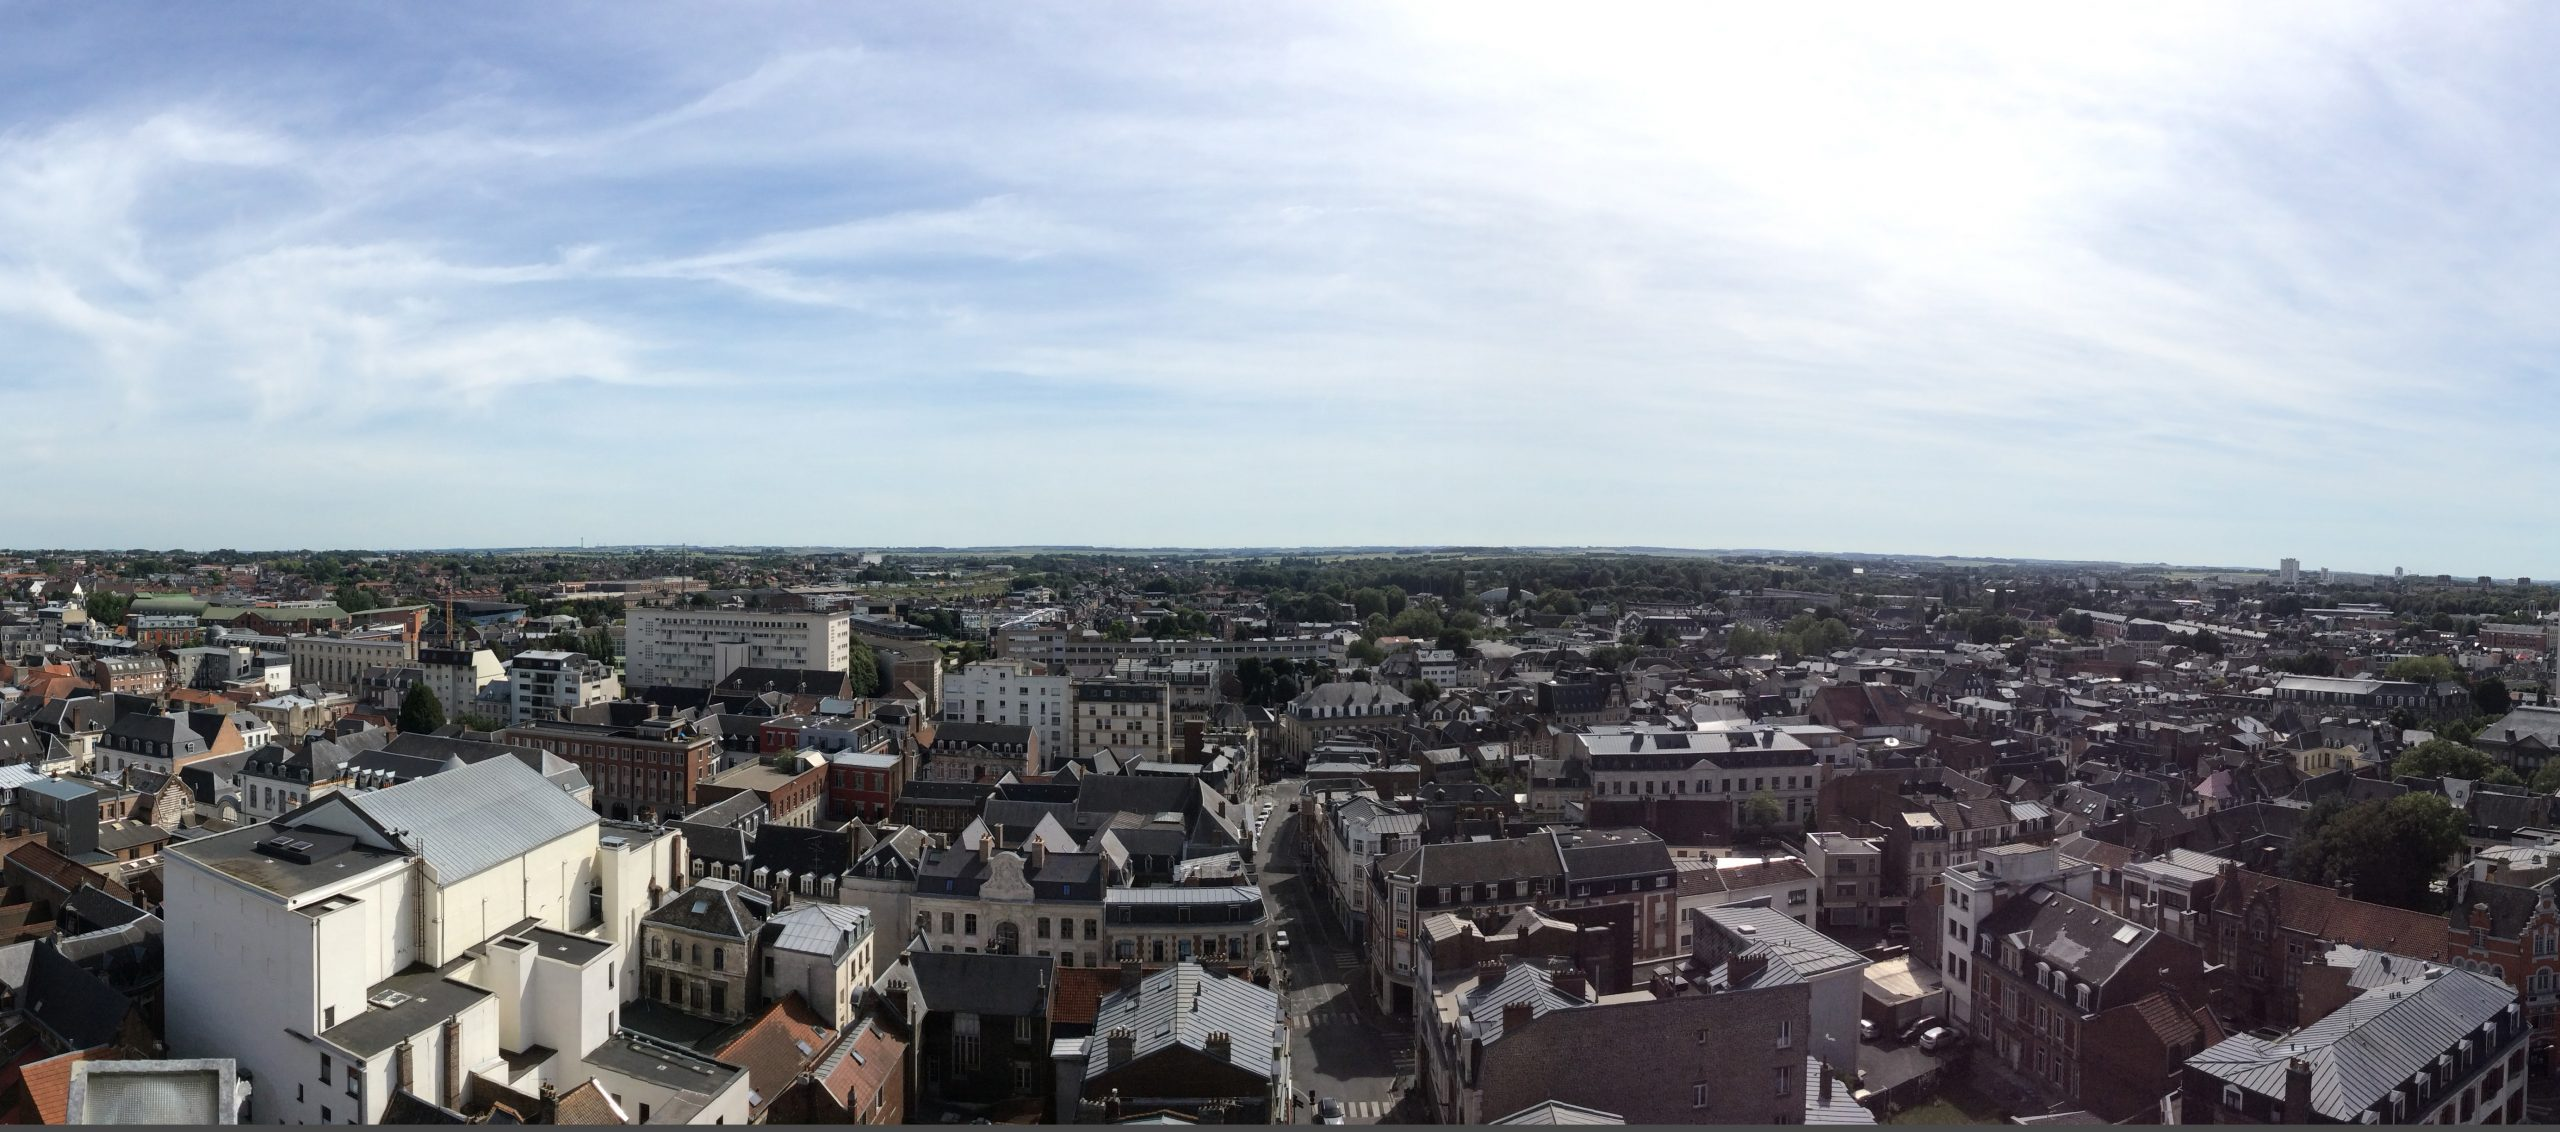 City of Arras France